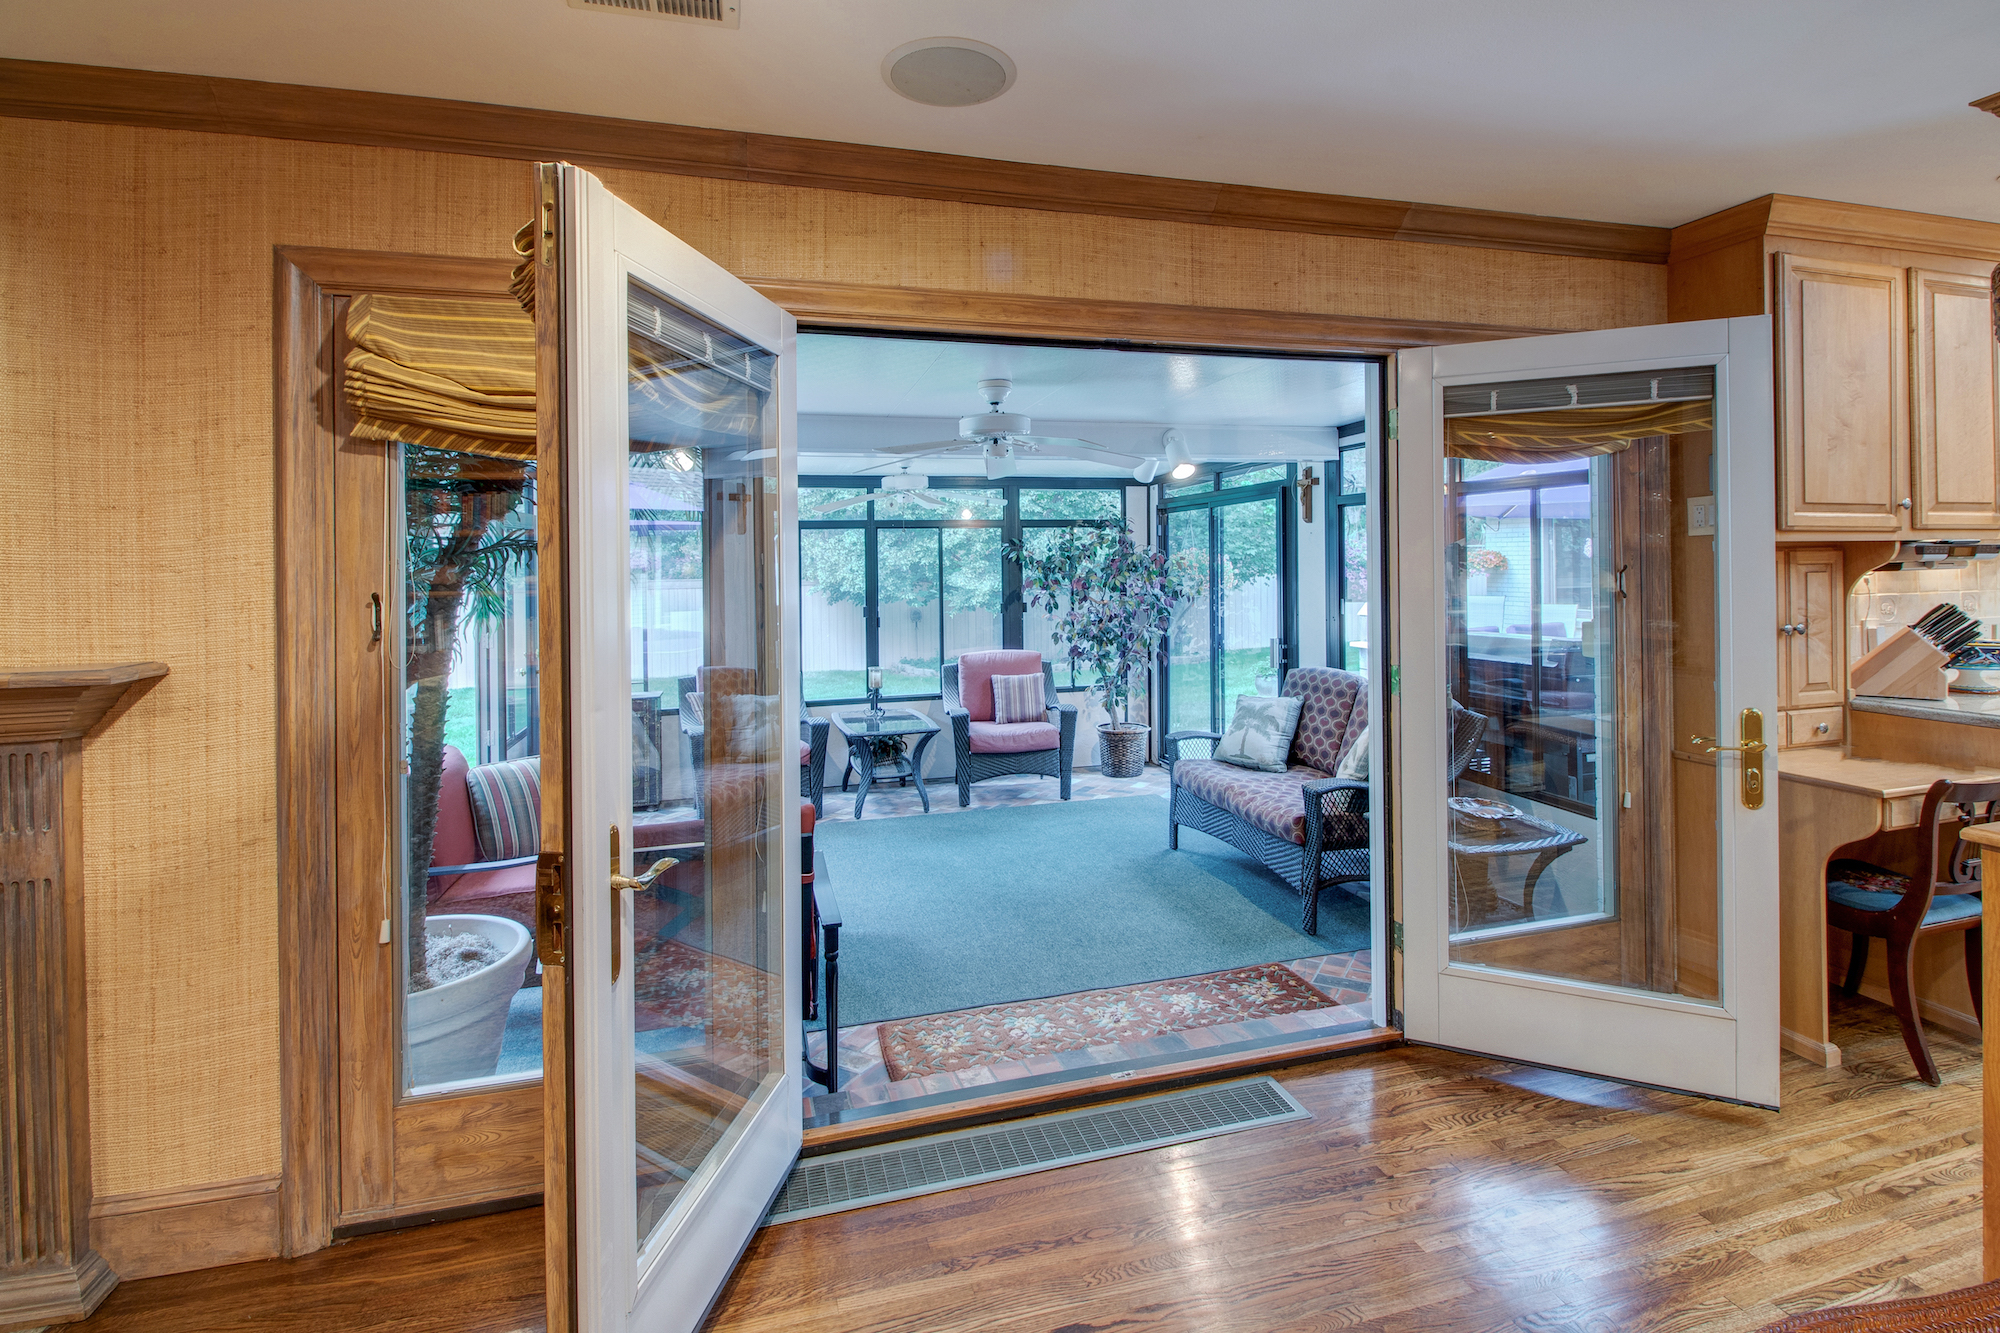 8-French doors in family room open to sunroom.jpg